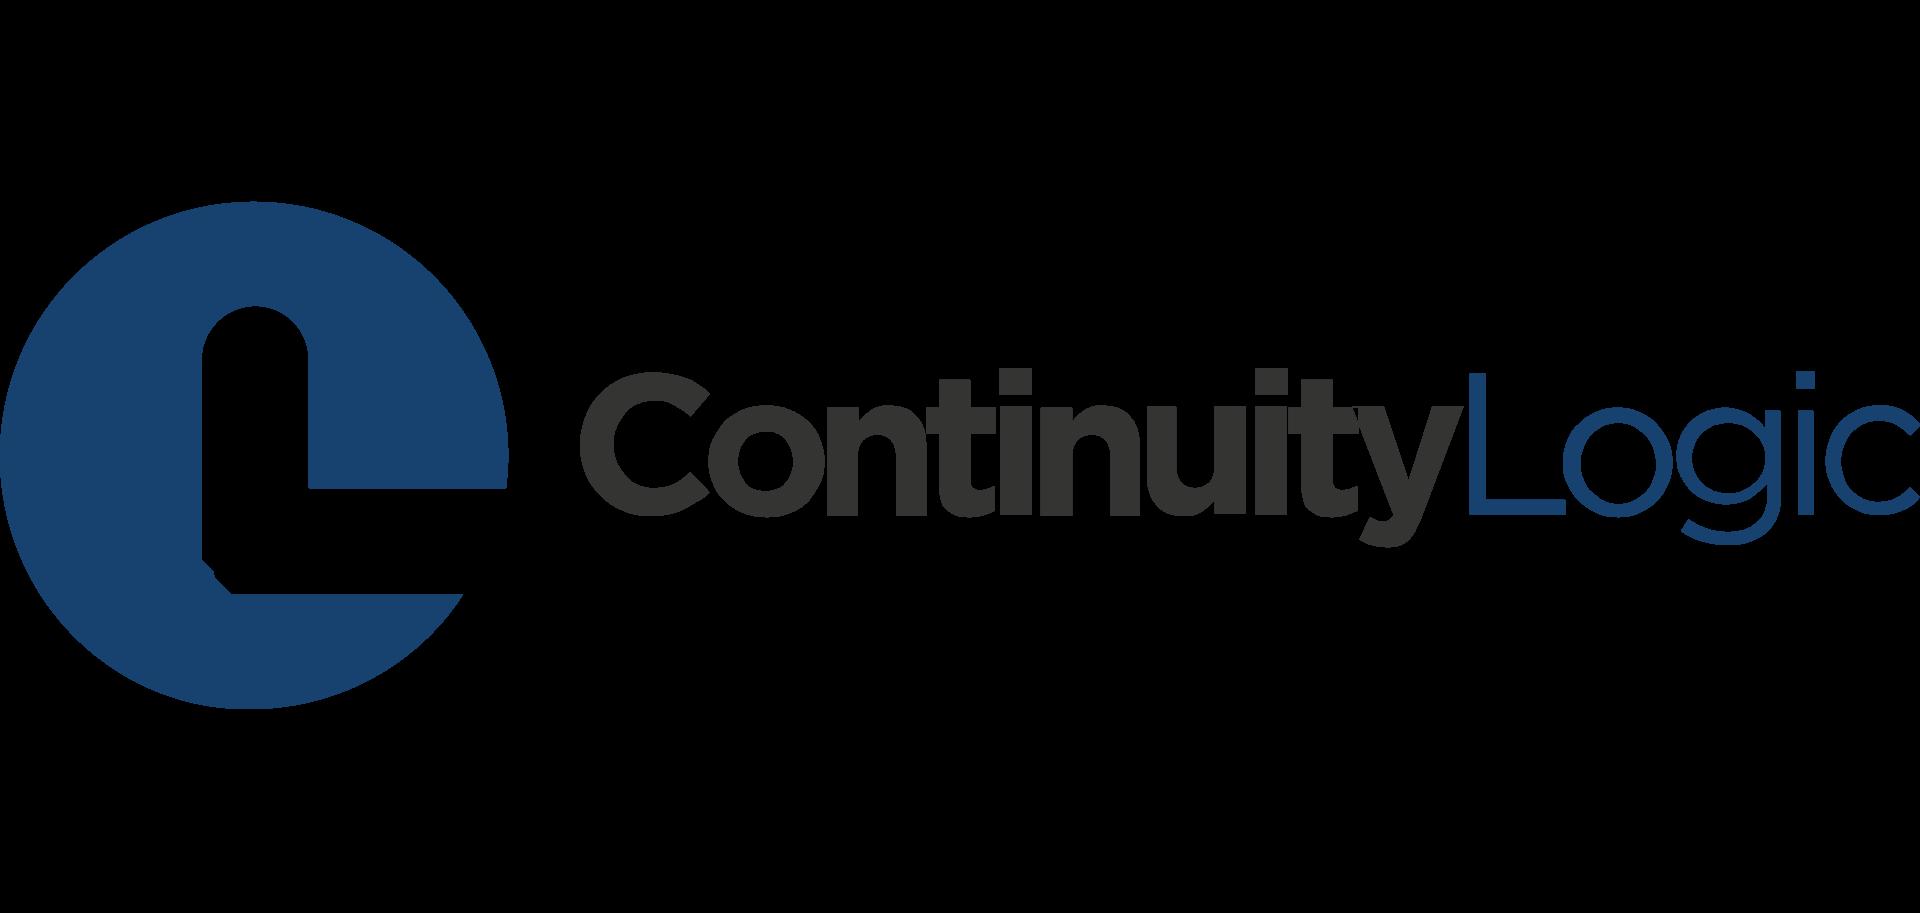 Continuity Logic Logo